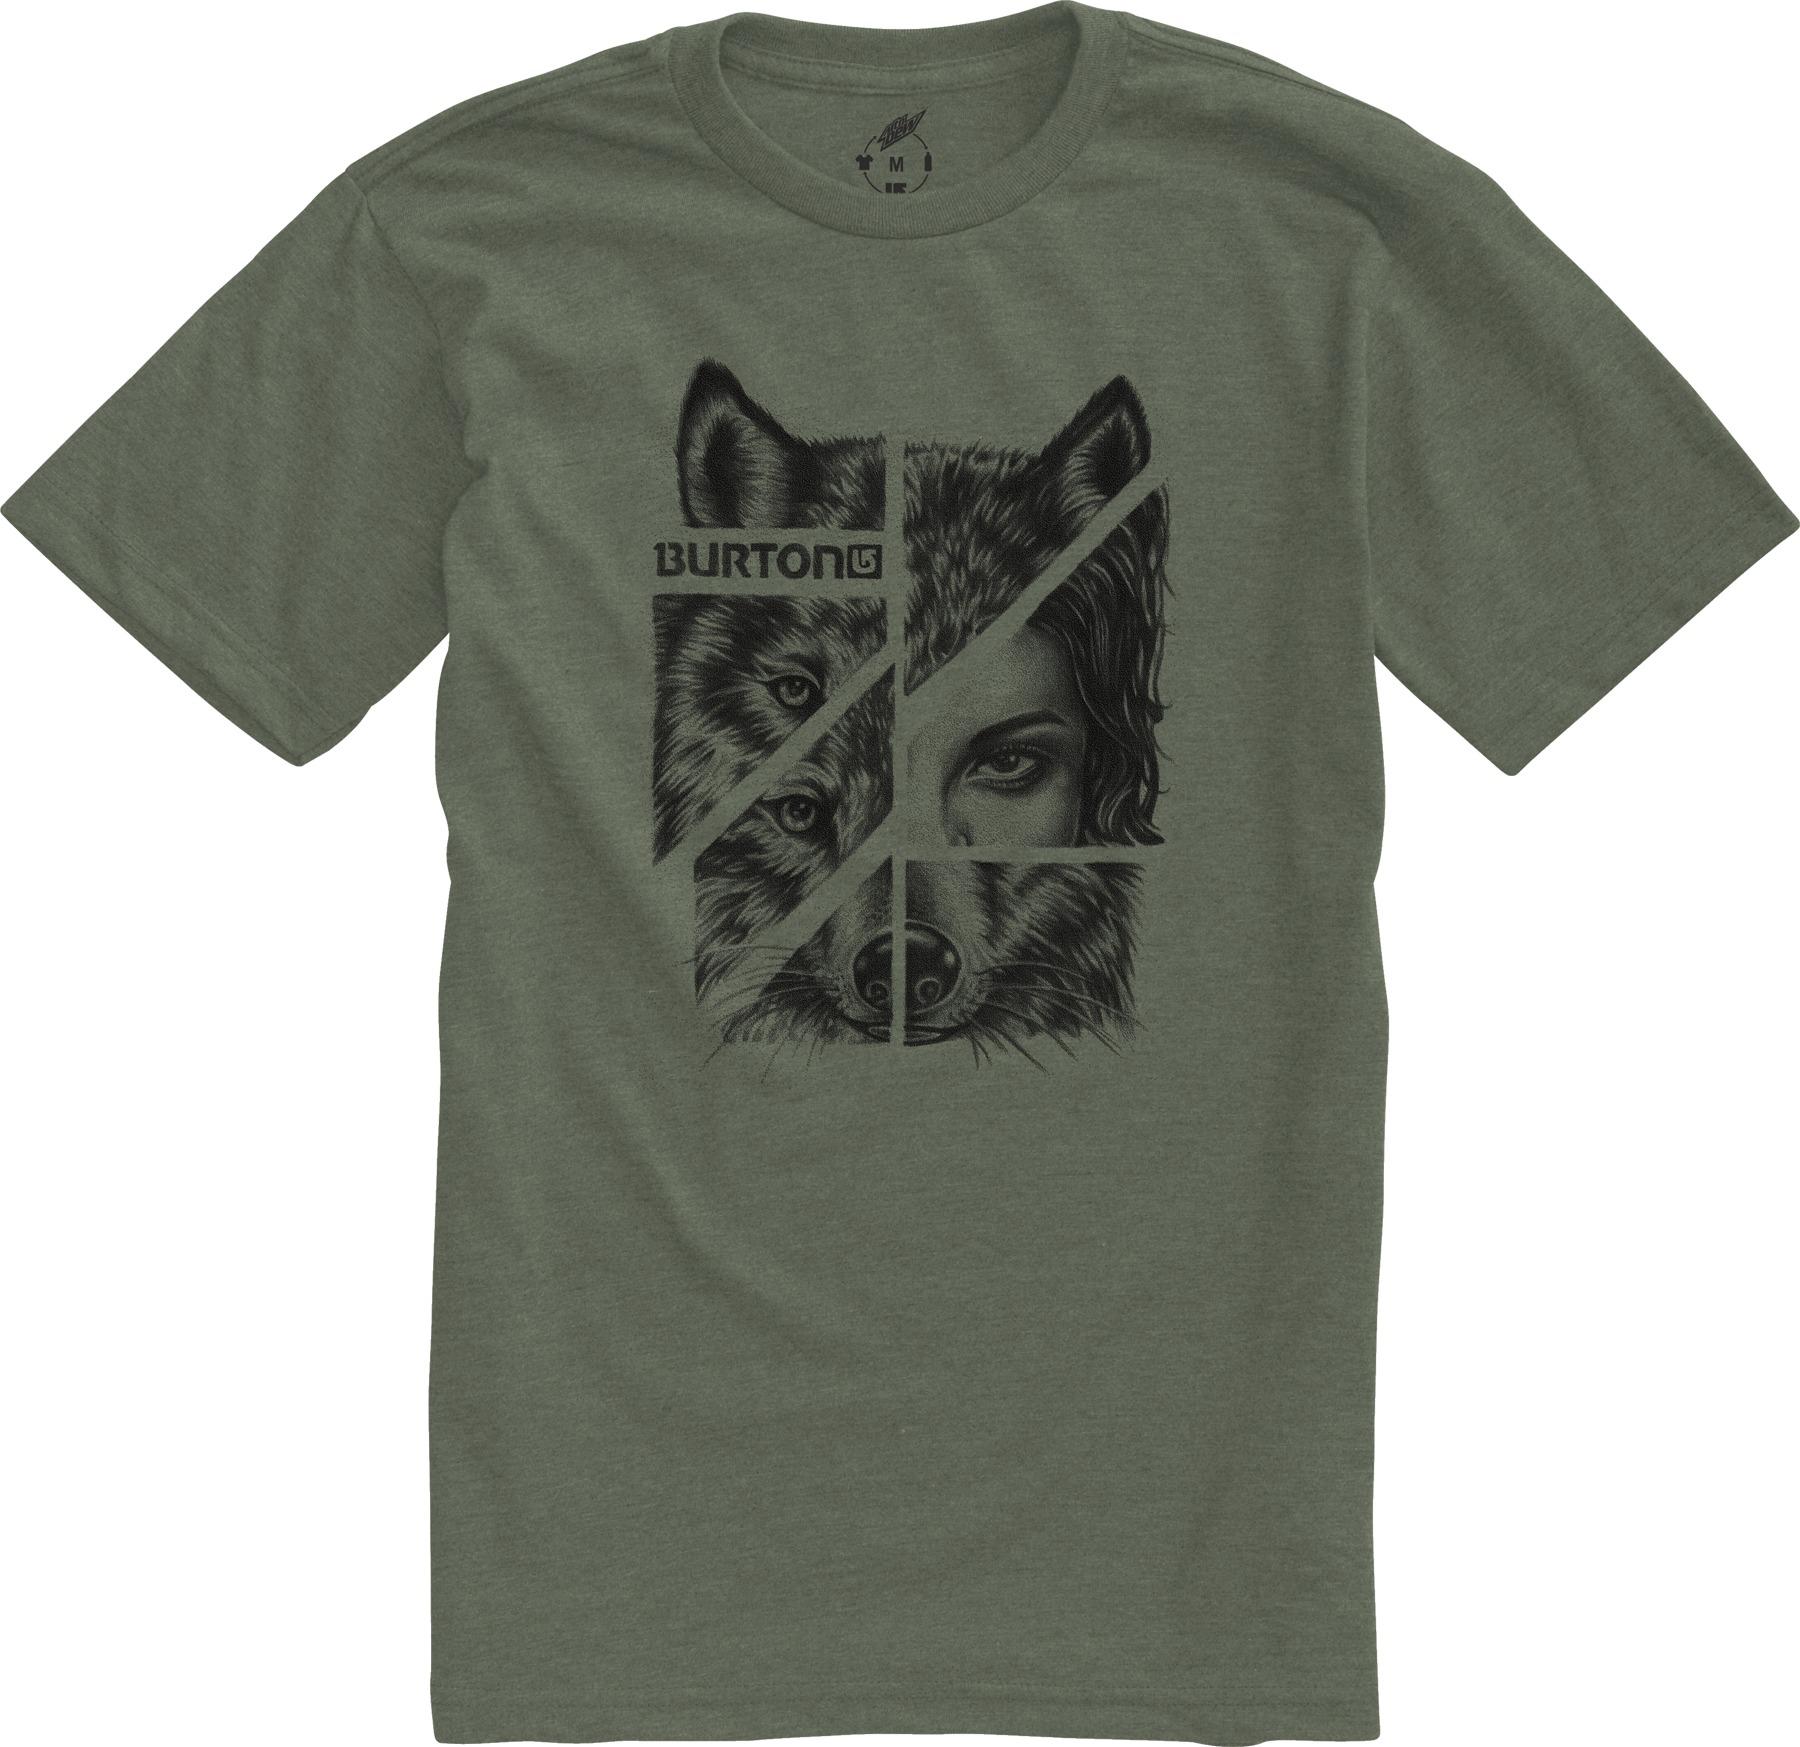 Koszulka Burton Shewolf Recycled (Heather Loam)